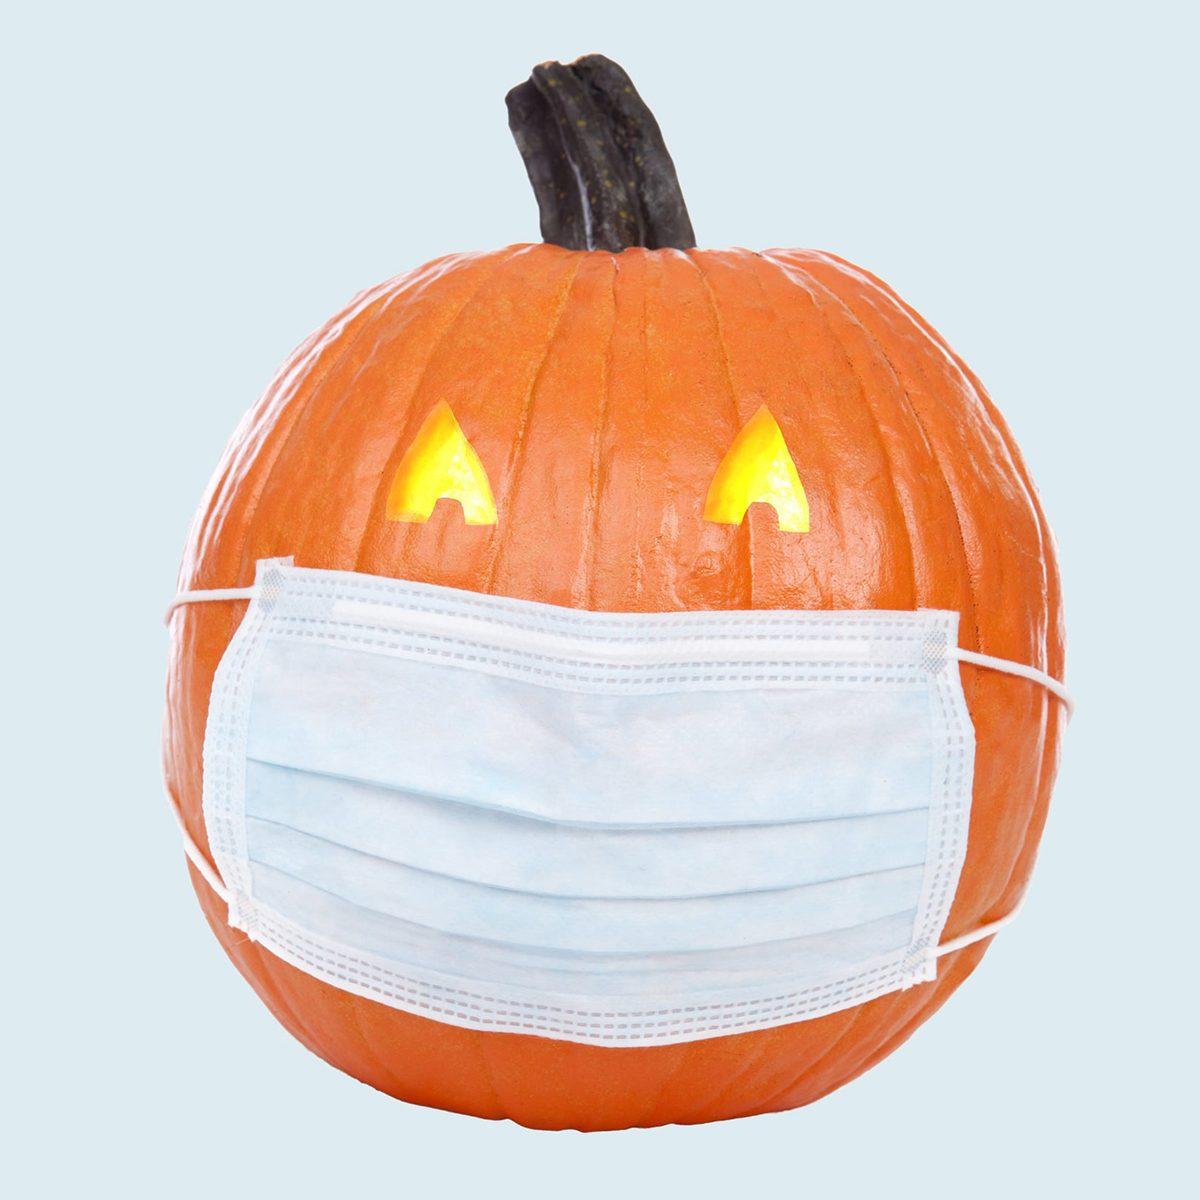 Jack-o-lantern wearing a face mask